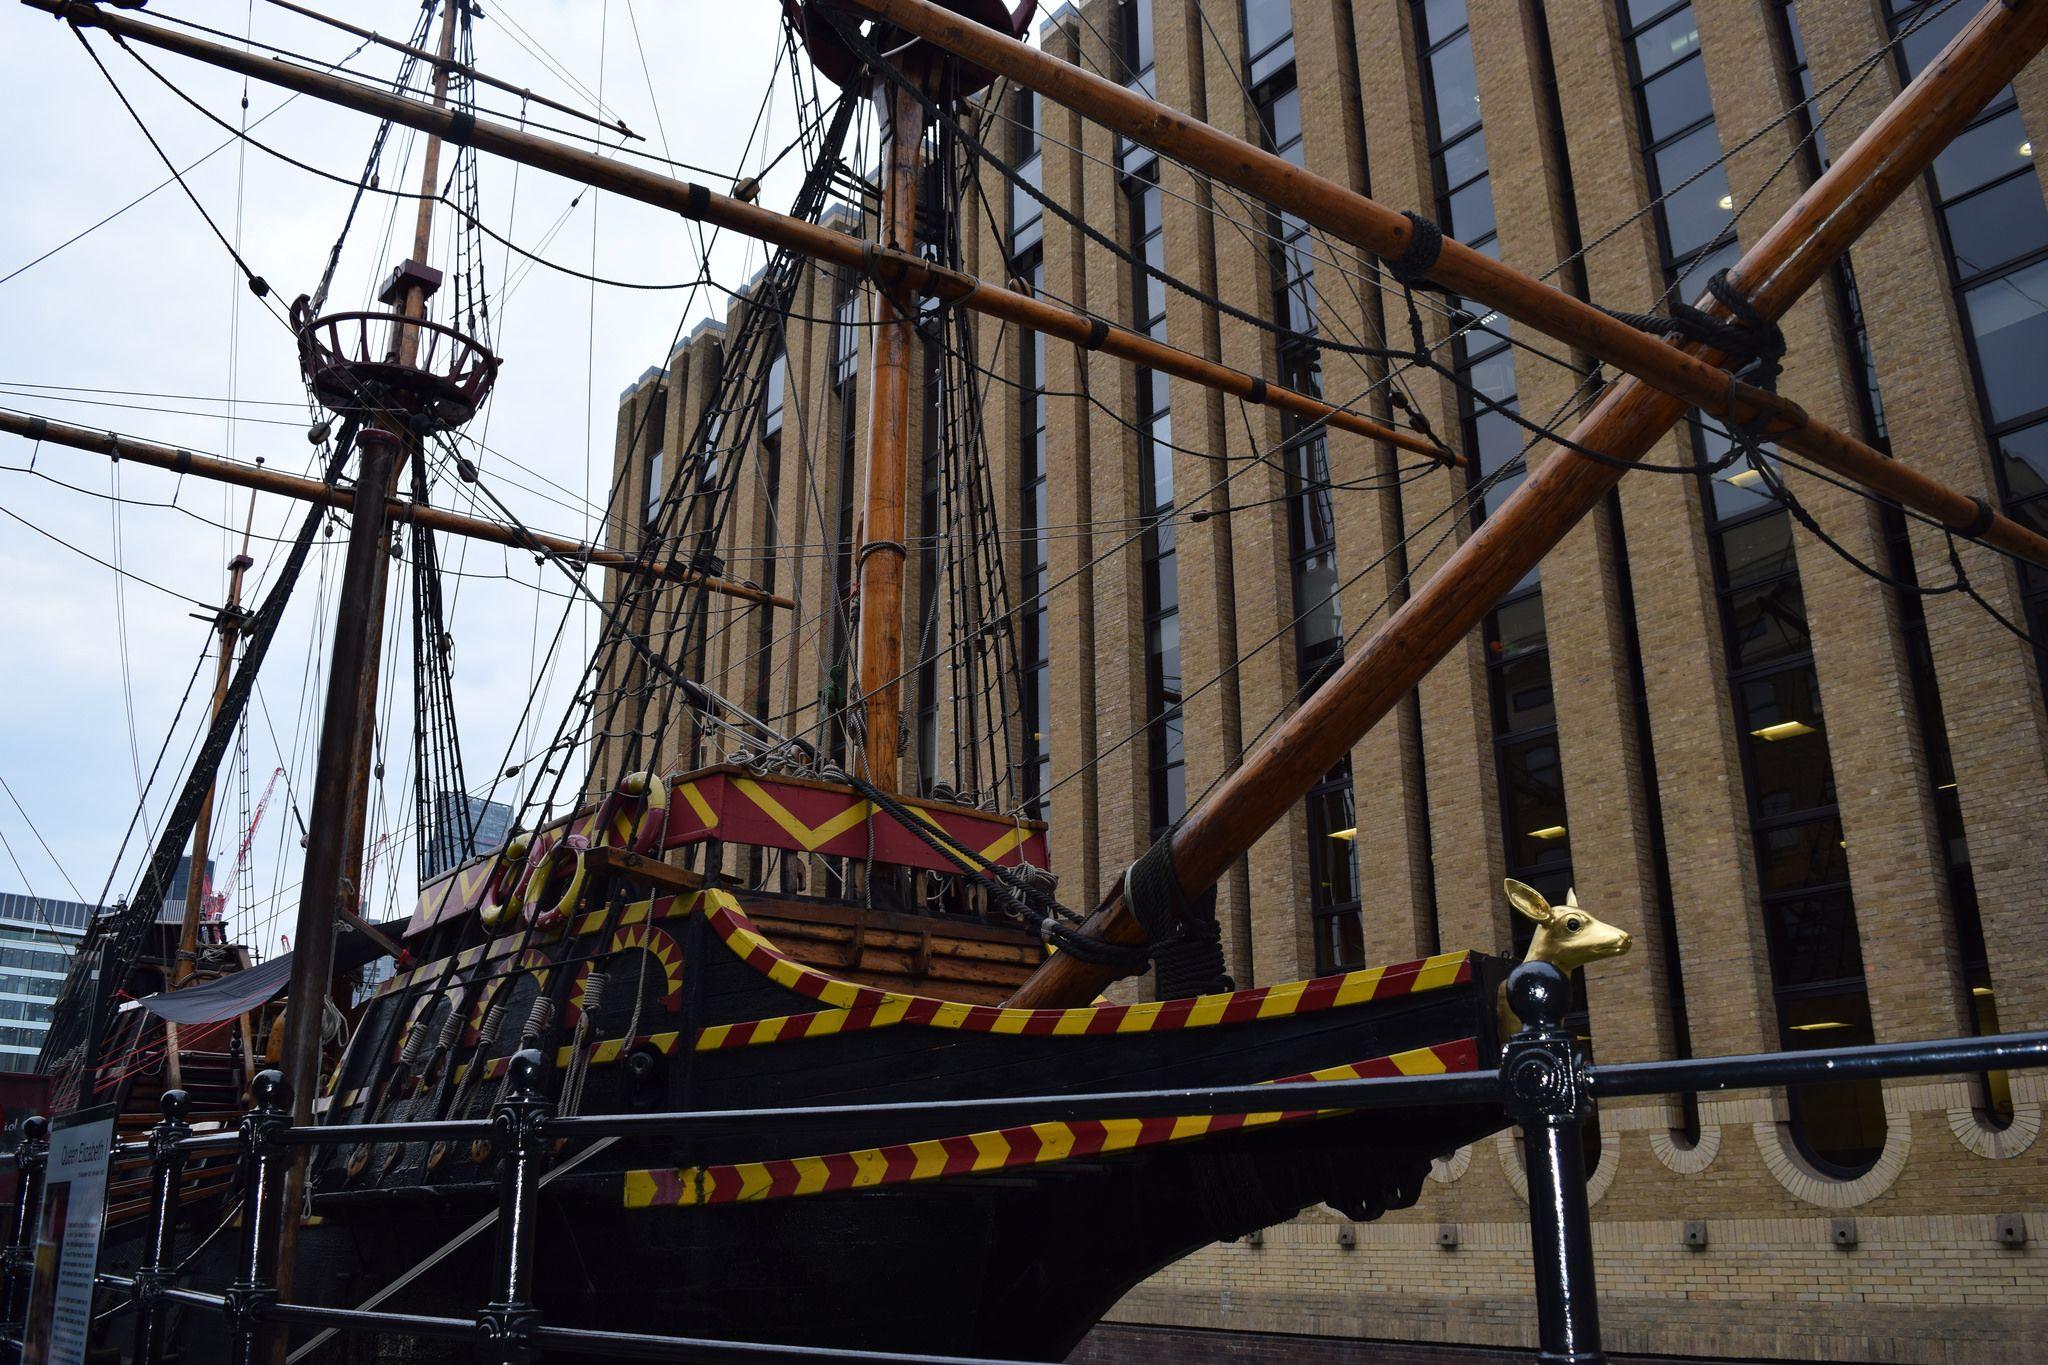 Dsc 0293 Harry Potter London London Tours Goblet Of Fire Ship models of famous ships. harry potter london london tours